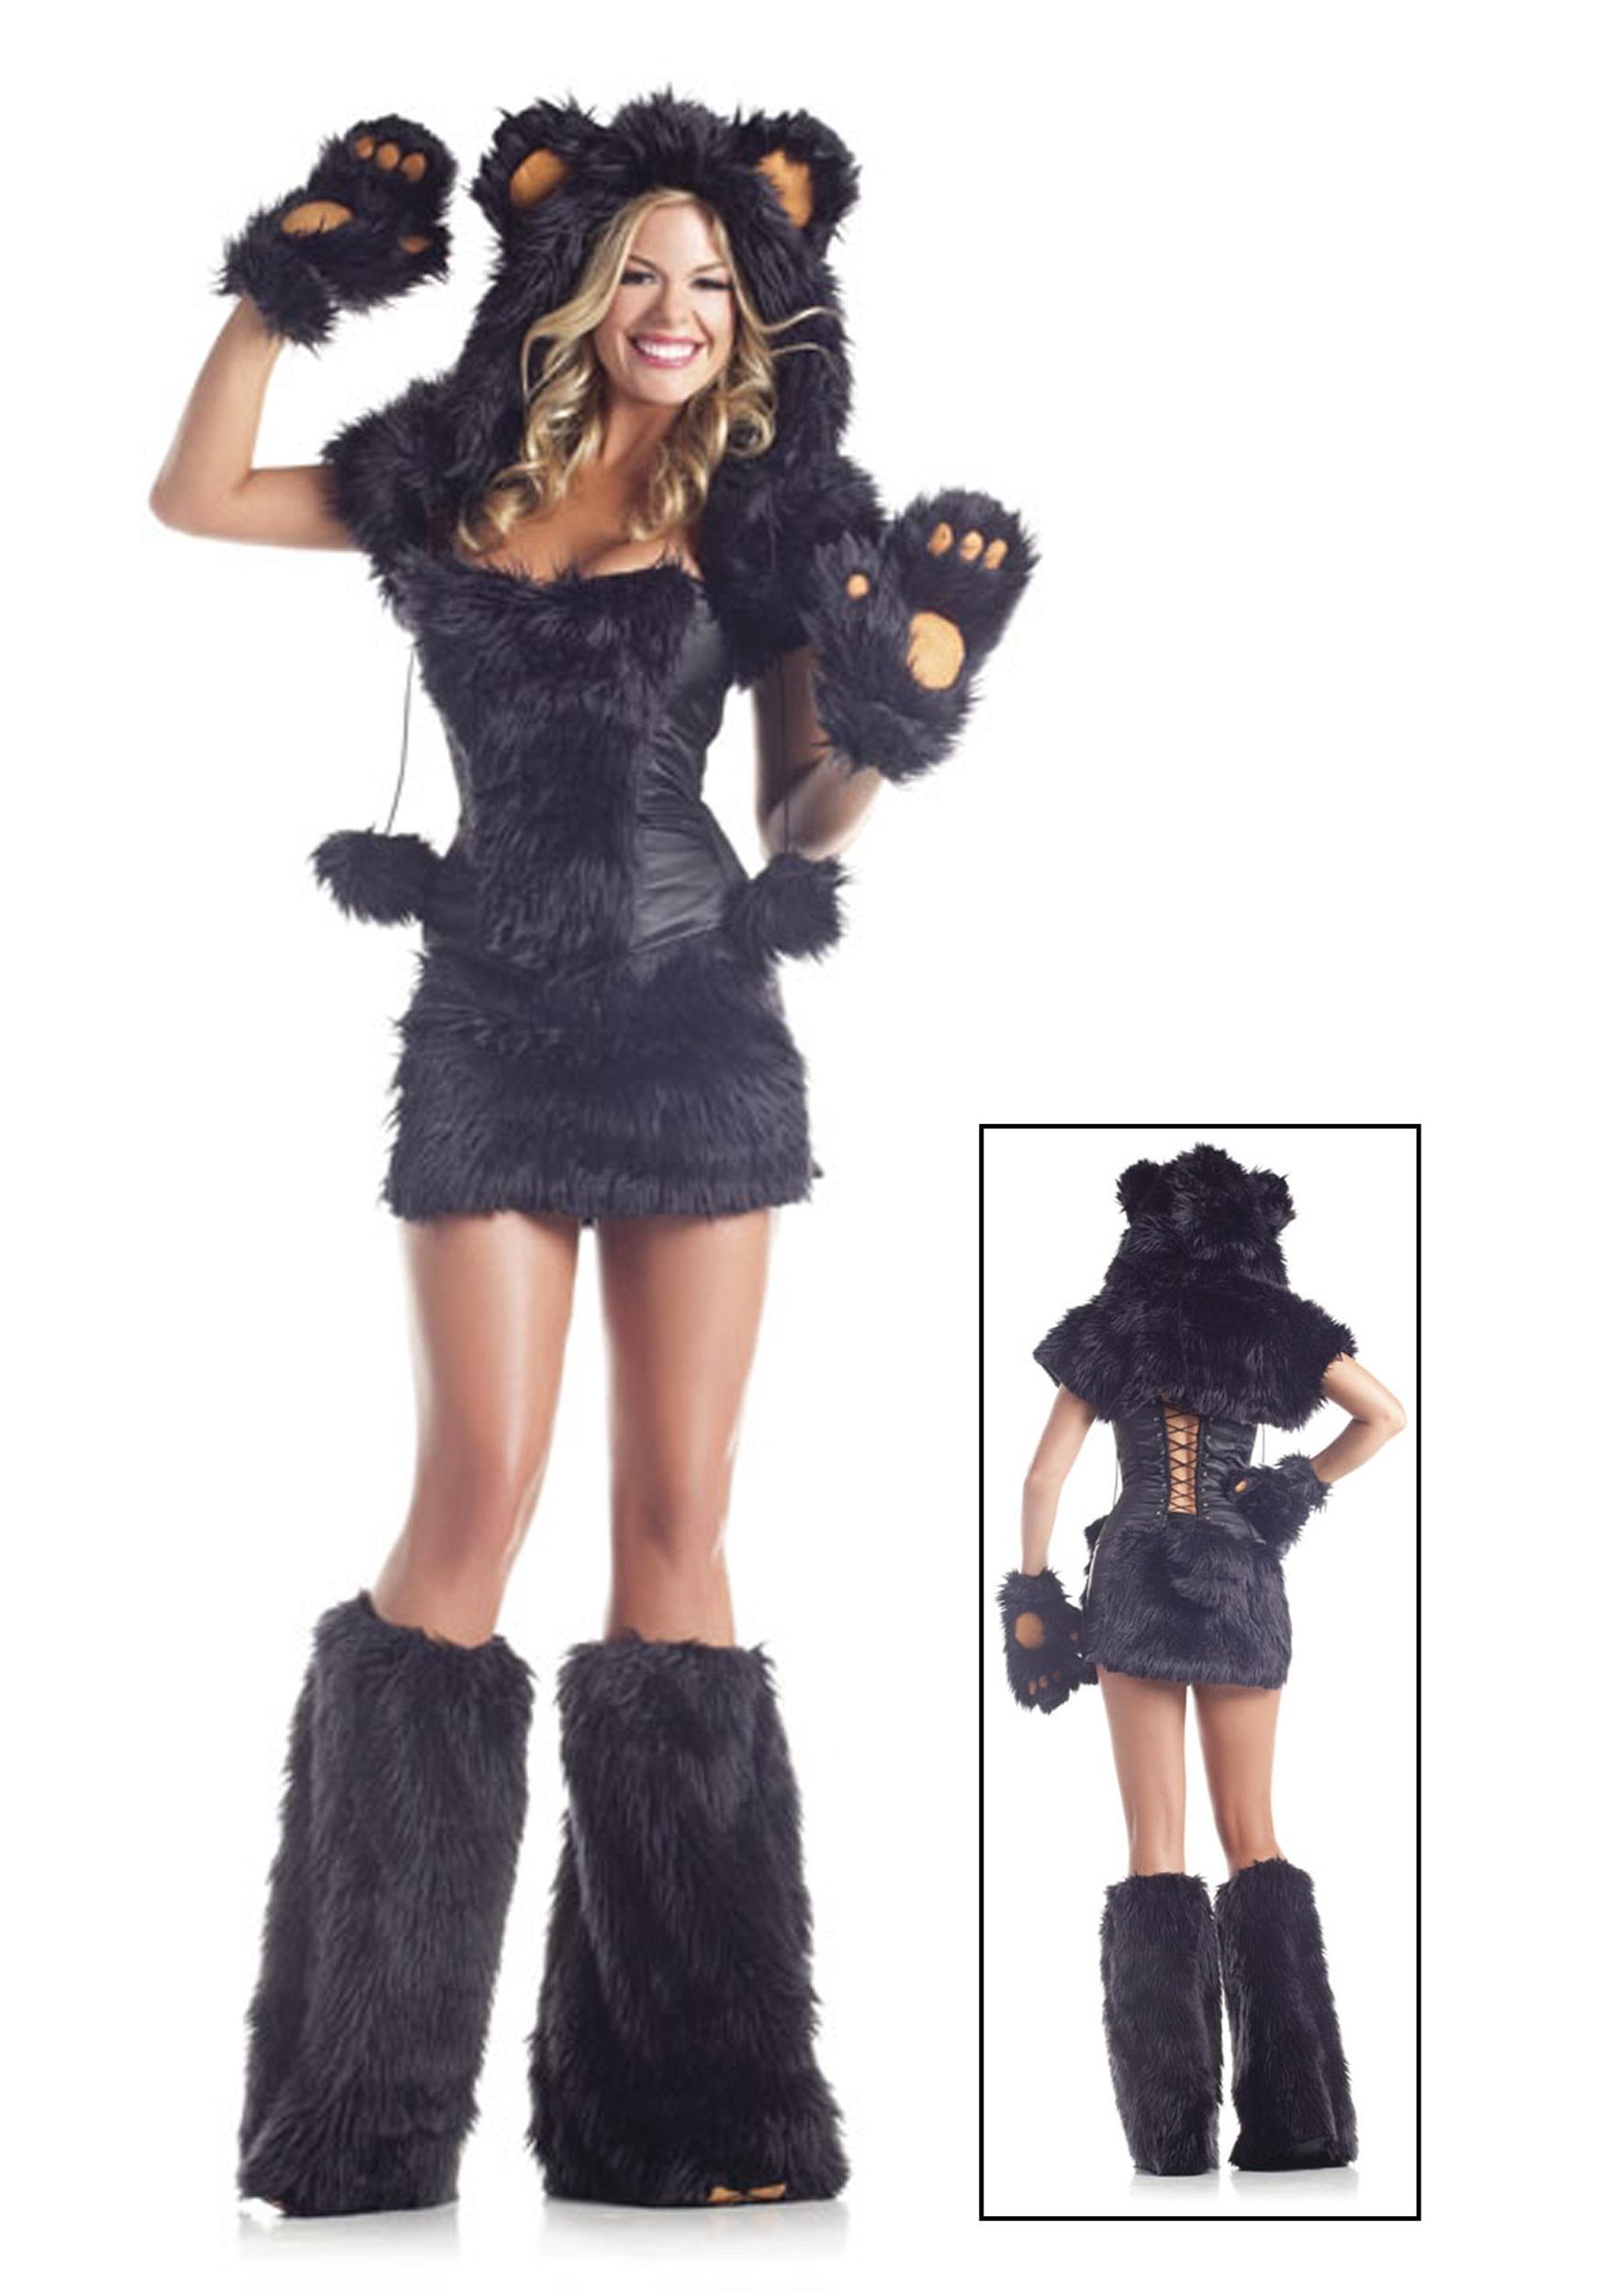 8 pc deluxe black bear costume - halloween costumes